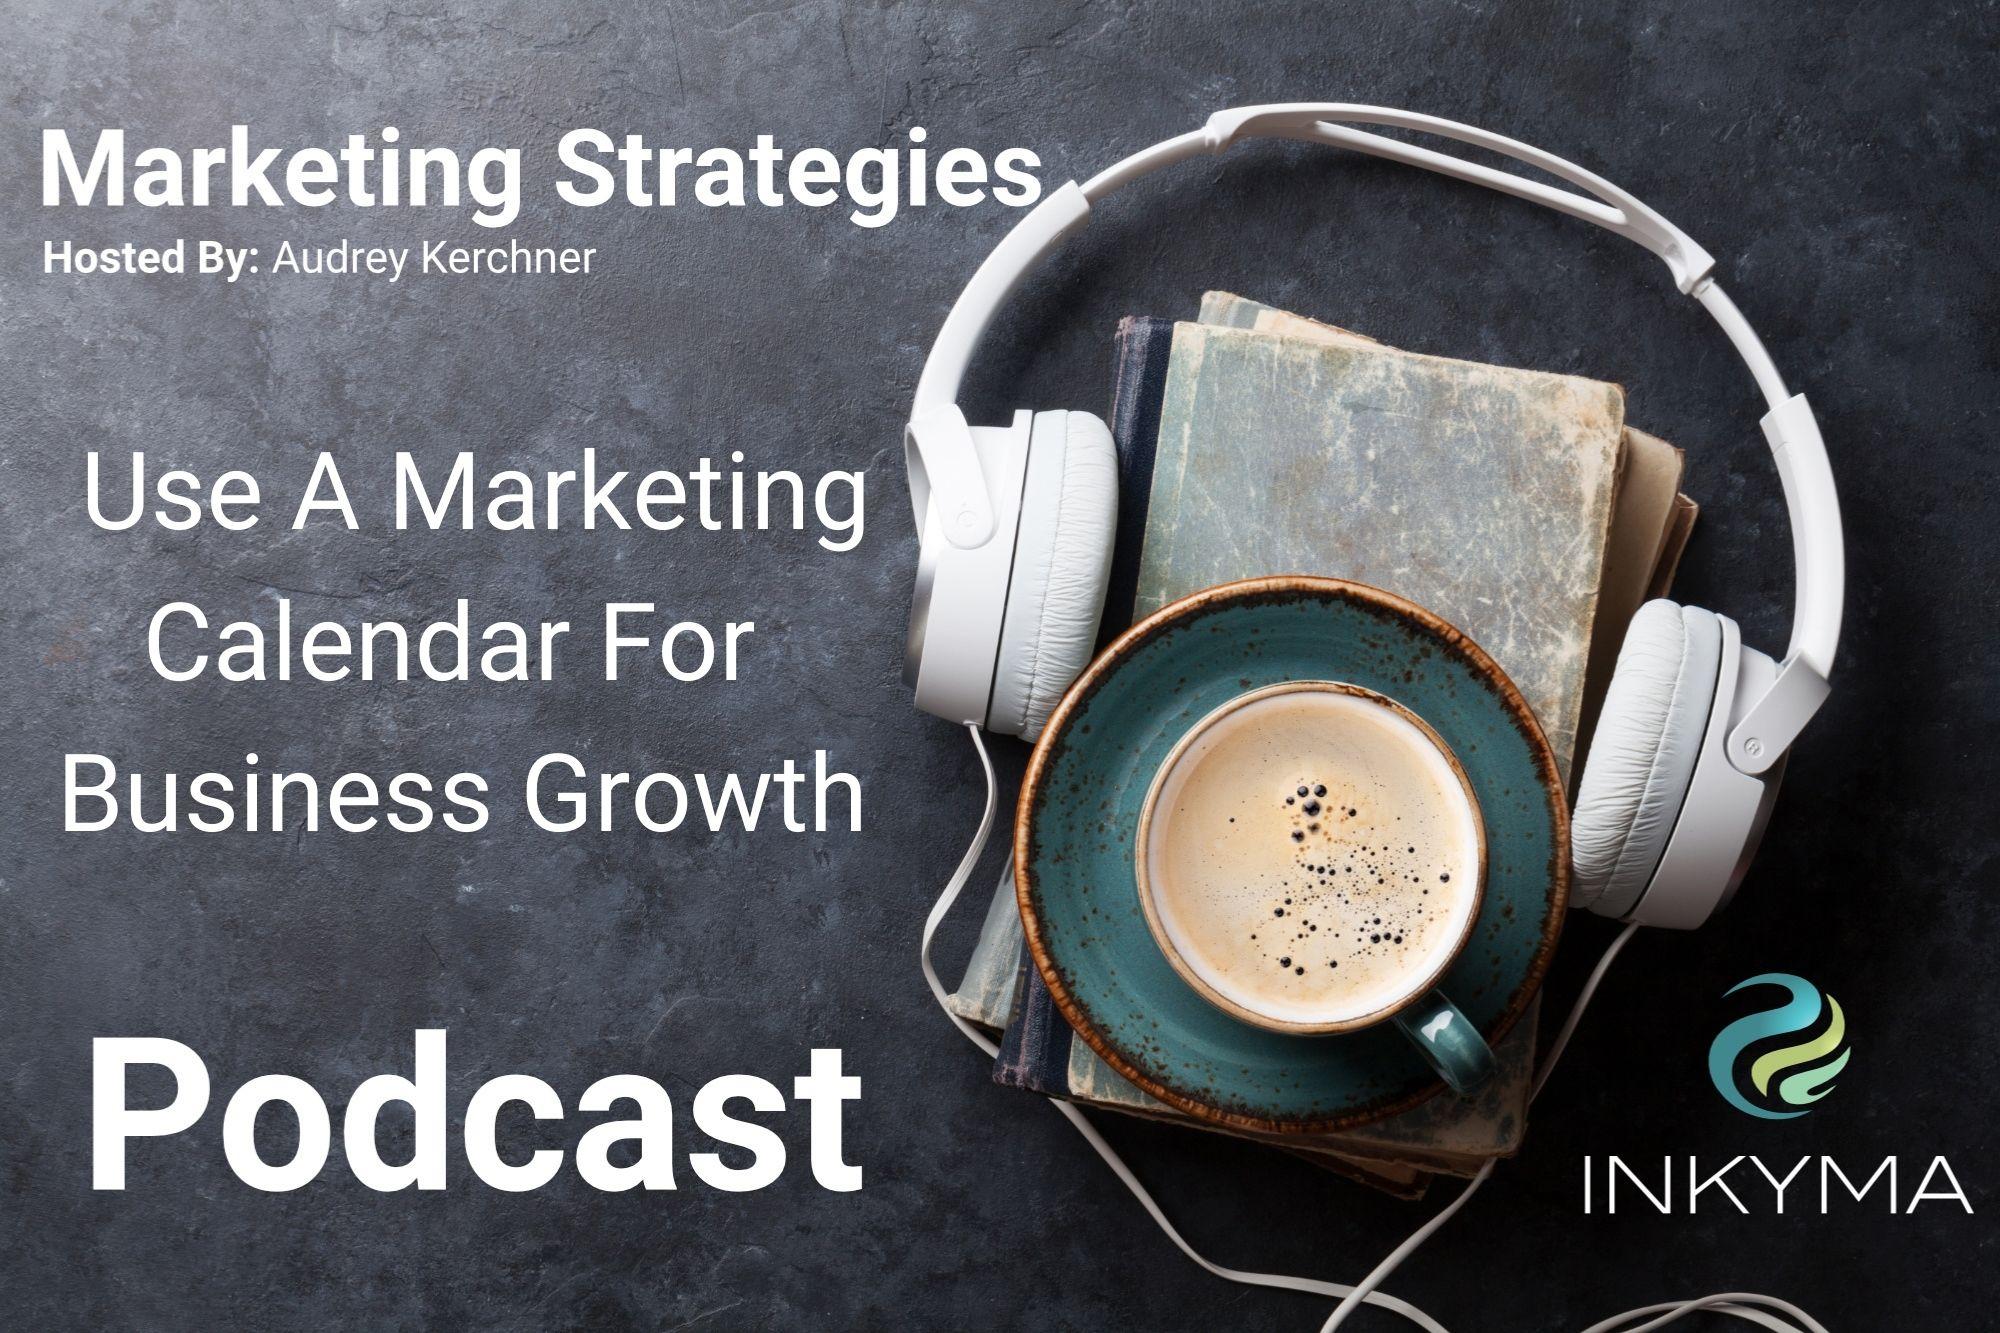 Use A Marketing Calendar For Business Growth